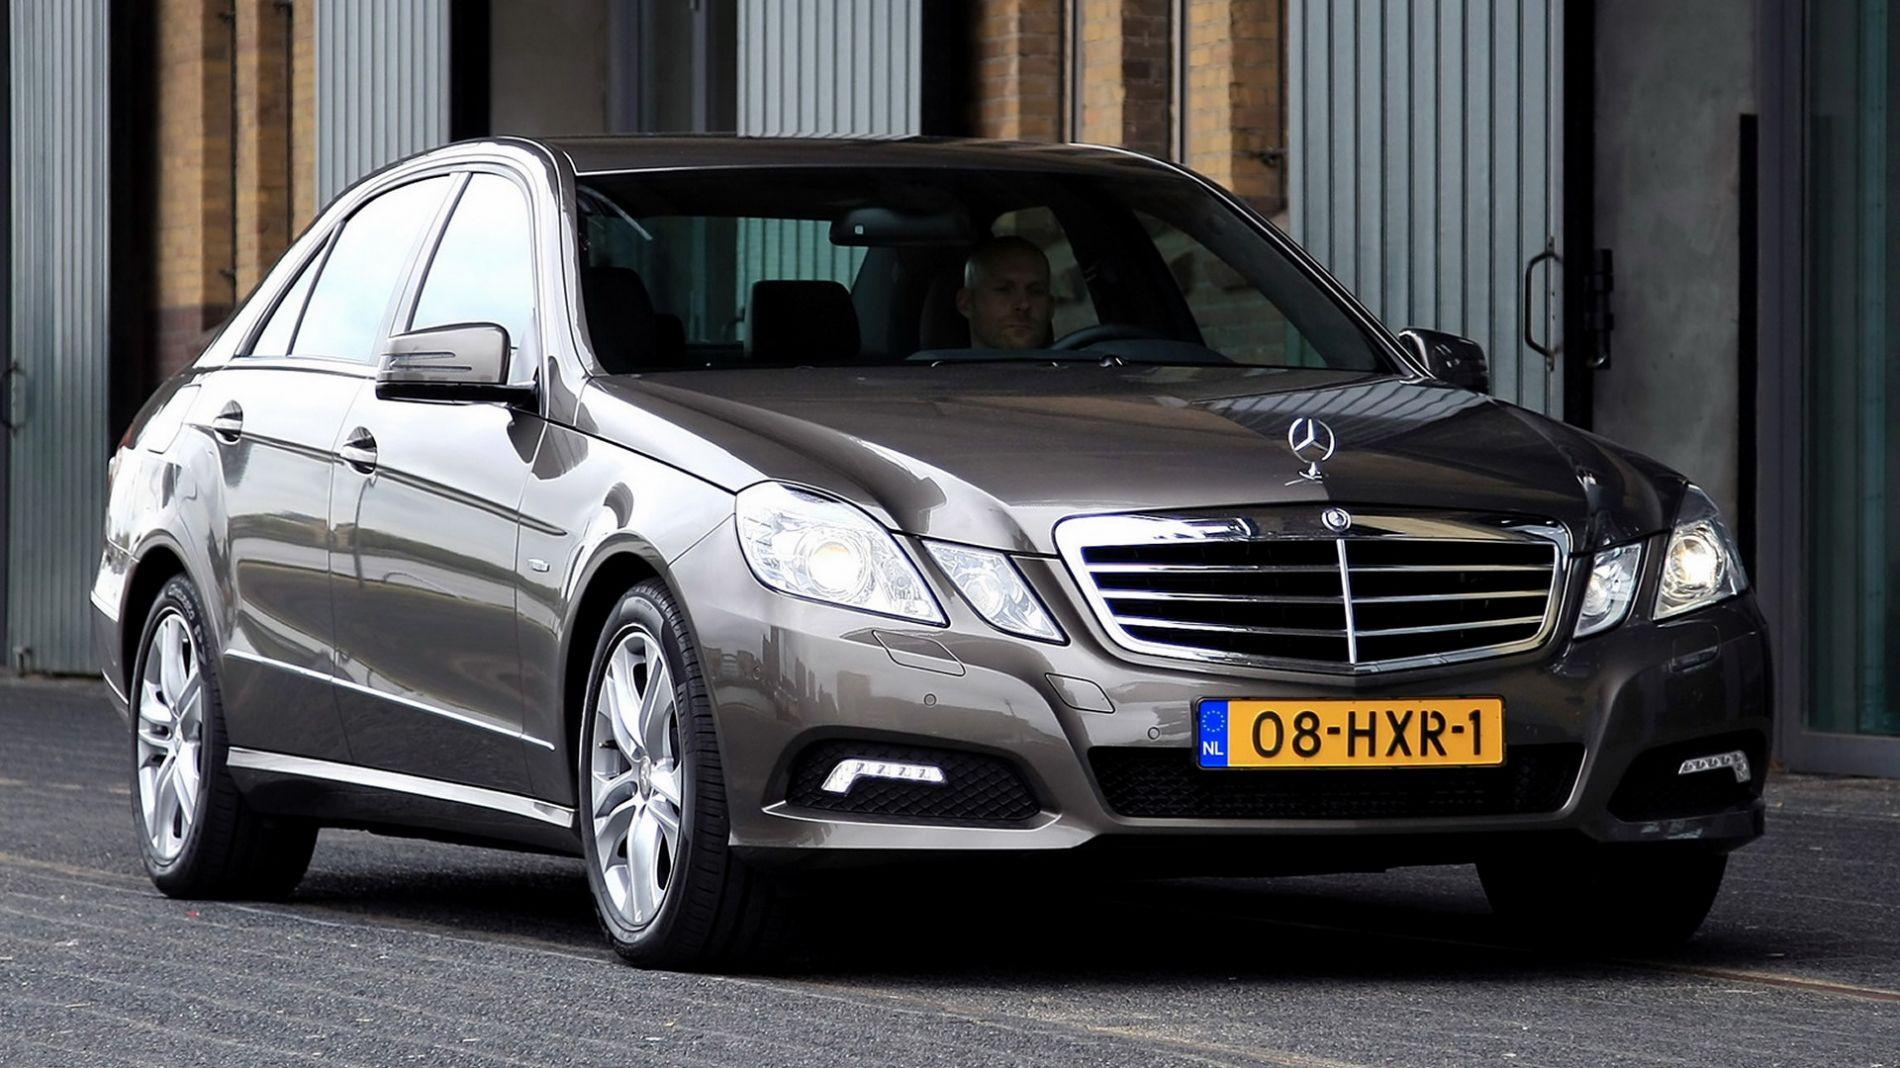 2009-16 Mercedes Benz E Class-ის 5 გავრცელებული პრობლემა